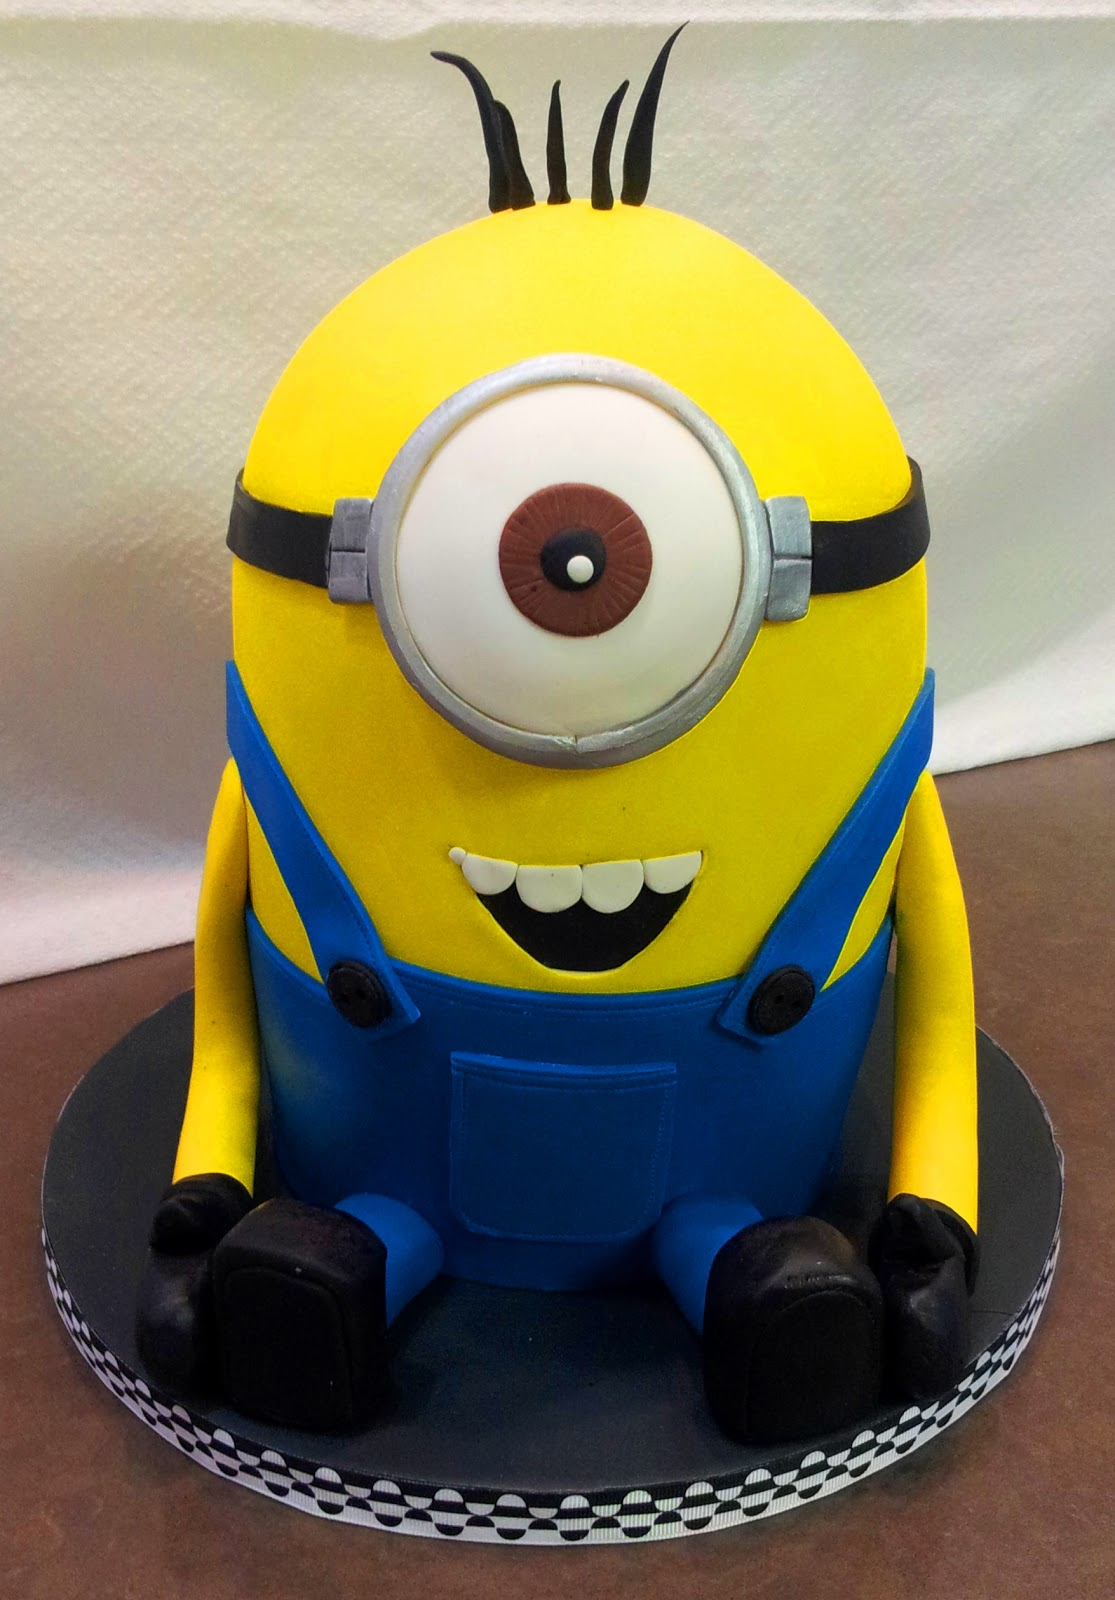 J Adore Cakes Co Minion Cake Class